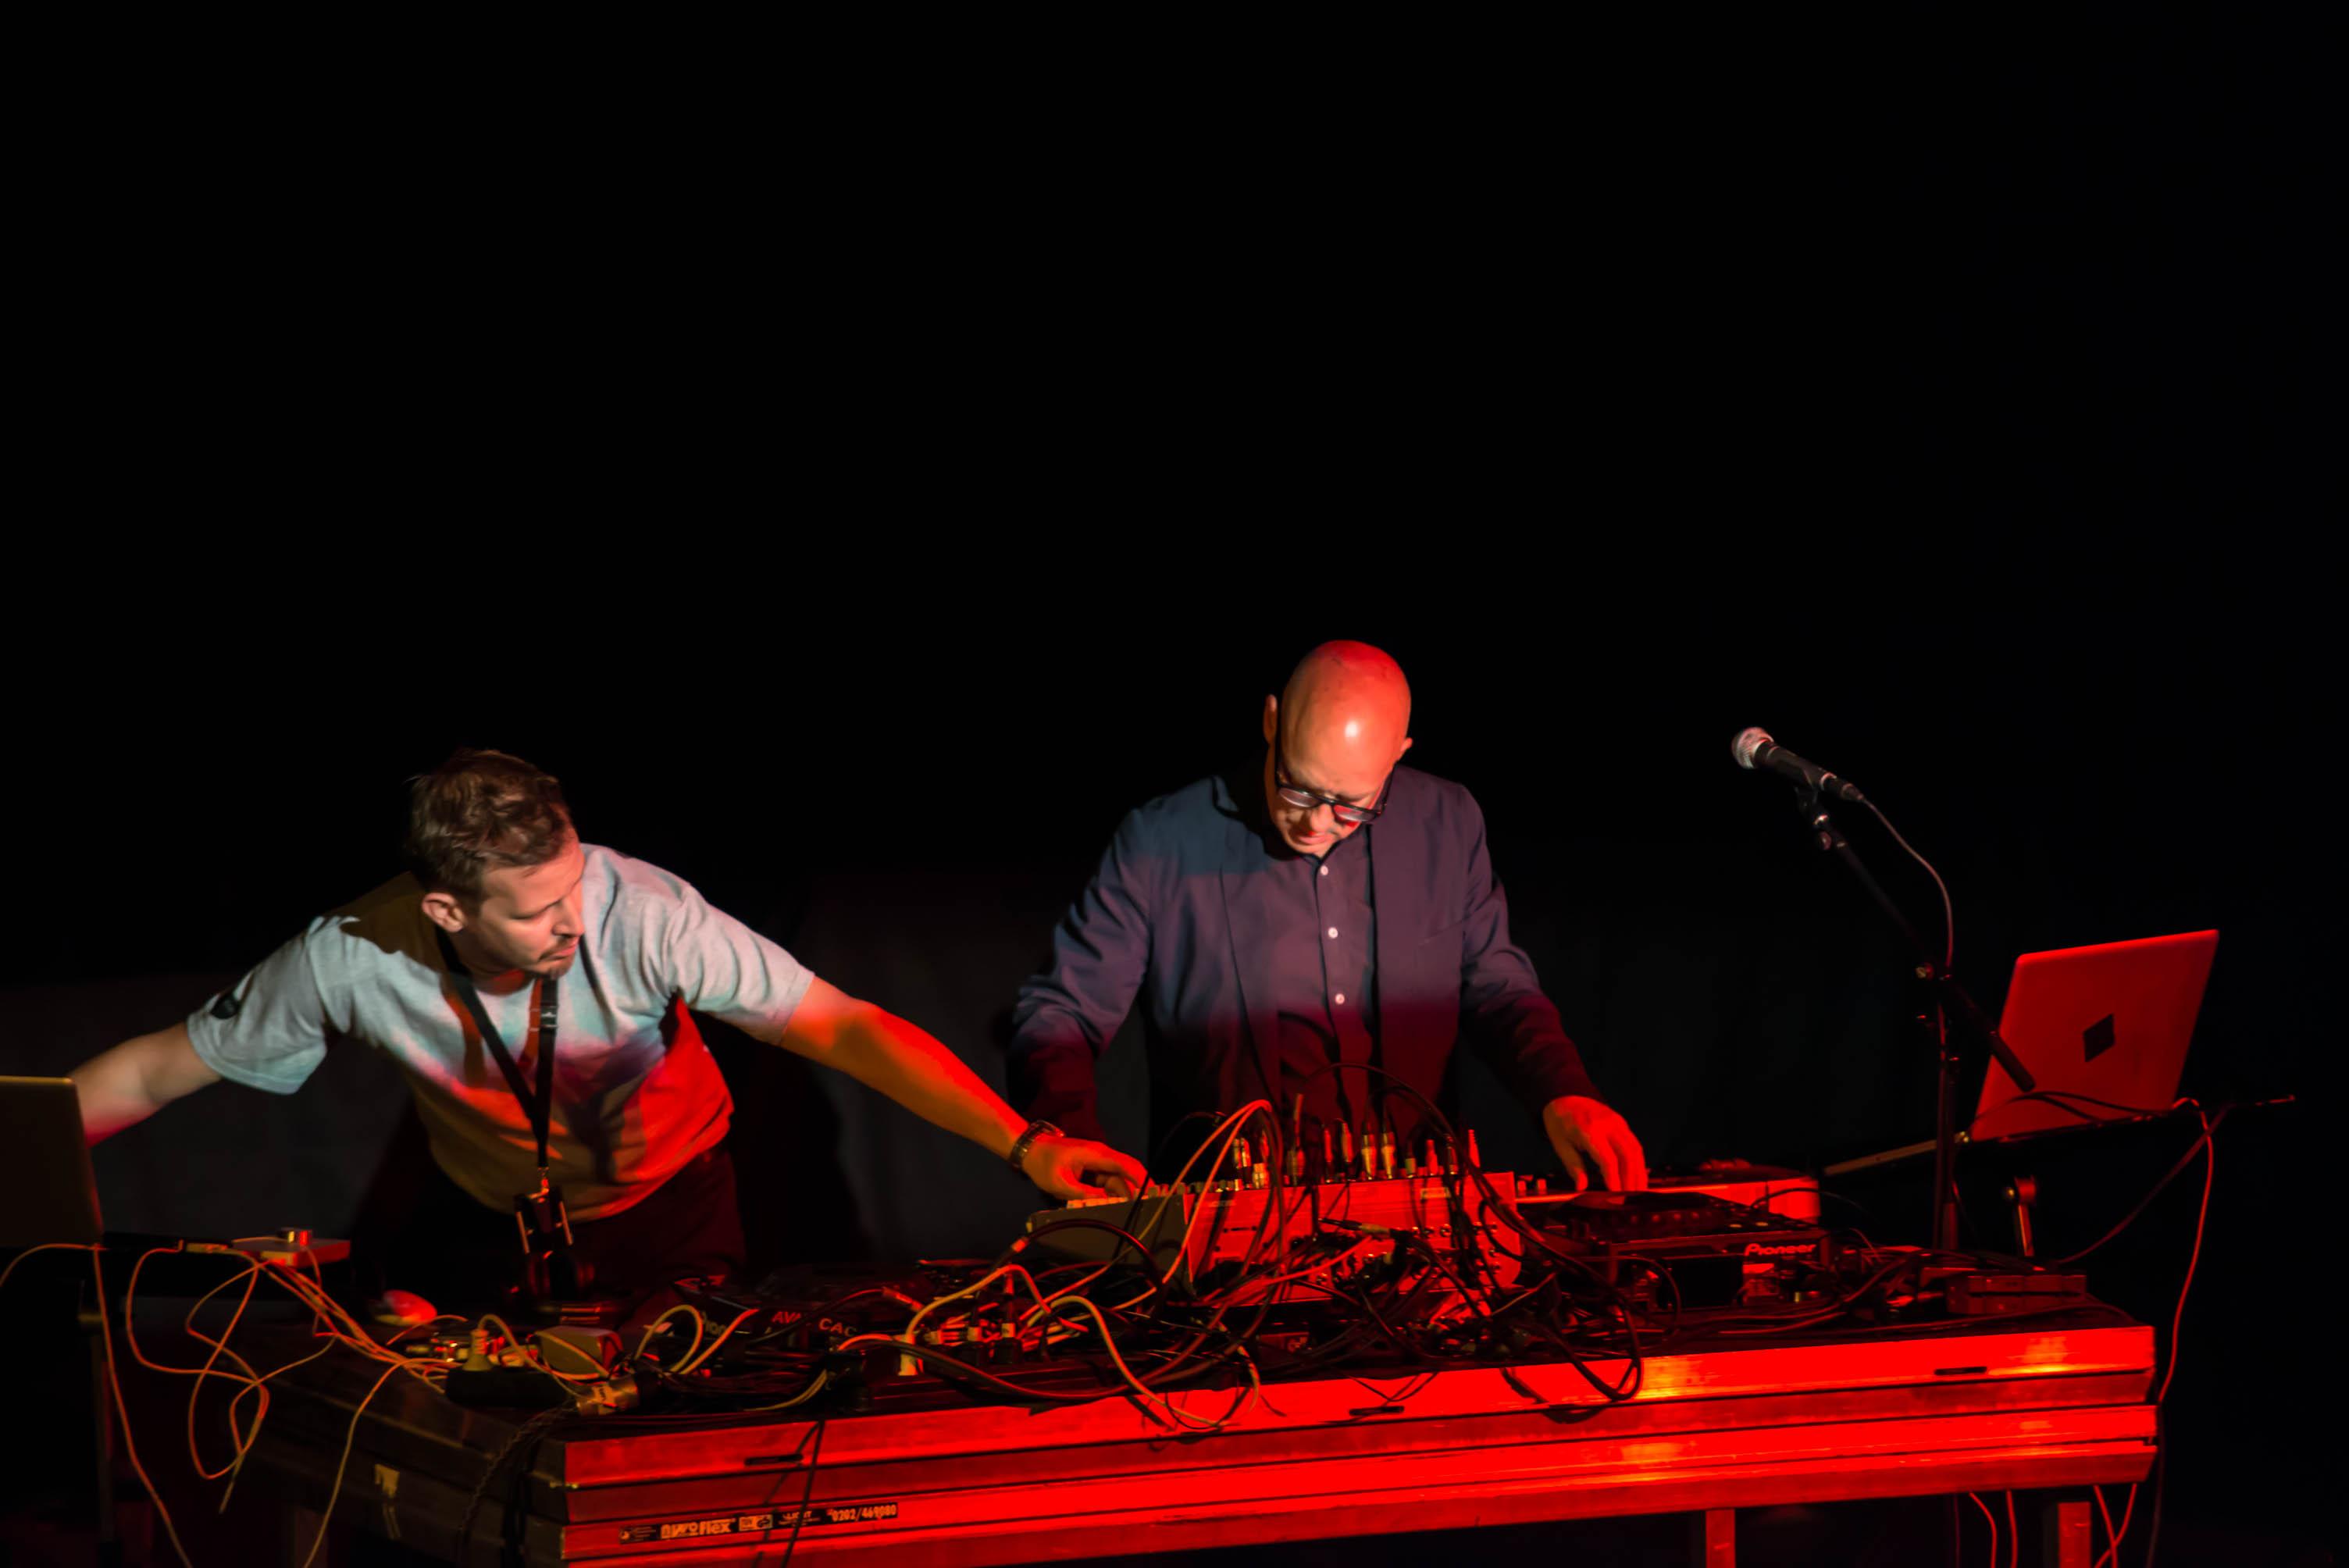 Punkt 2012: Brian Eno/J. Peter Schwalm